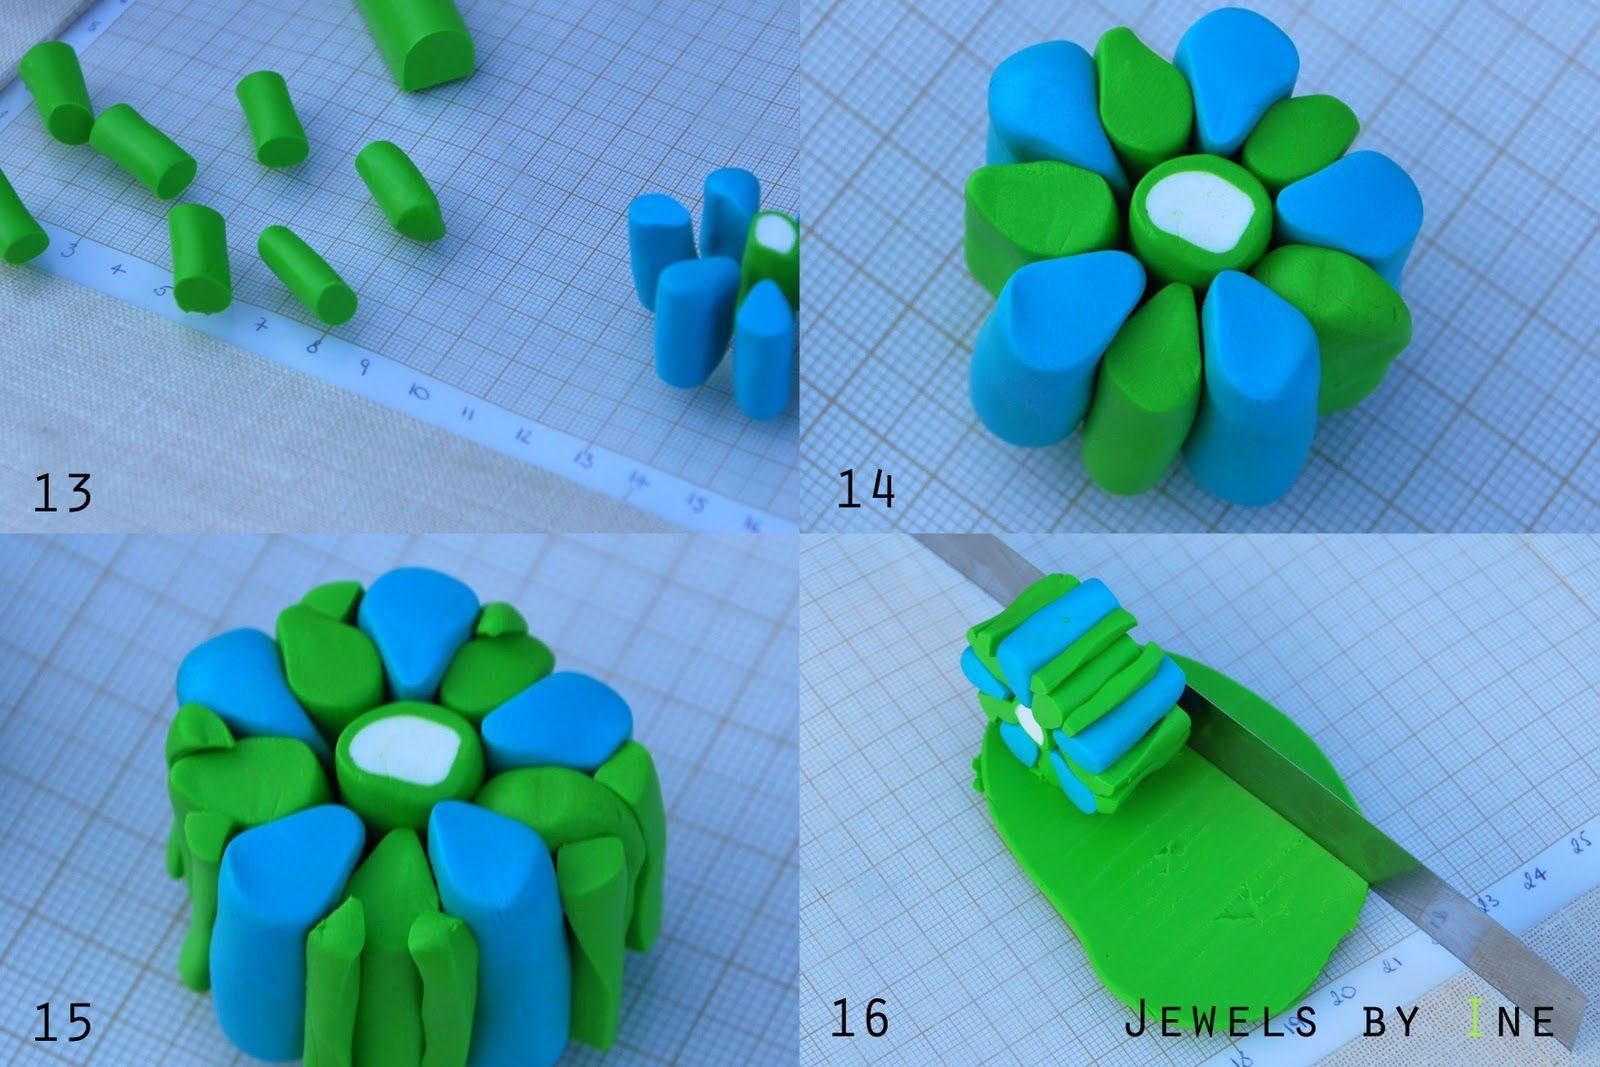 Jewels by Ine: oktober 2011